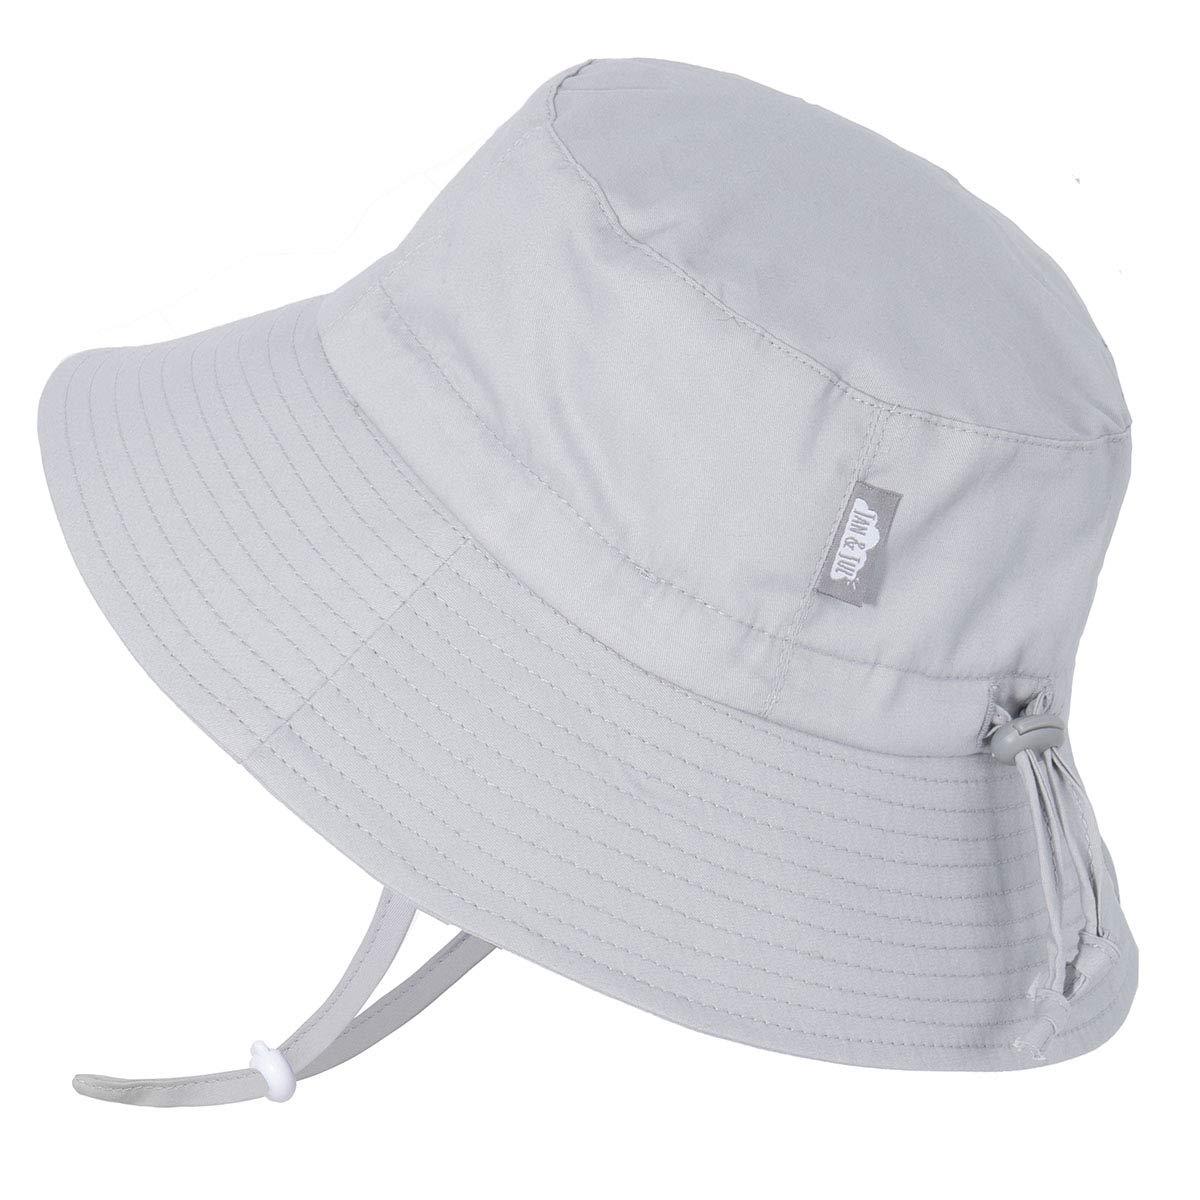 JAN & JUL Toddler Boys Girls Cotton Bucket Sun Hats 50 UPF, Drawstring Adjustable, Stay-on Tie (M: 6-24m, Grey)